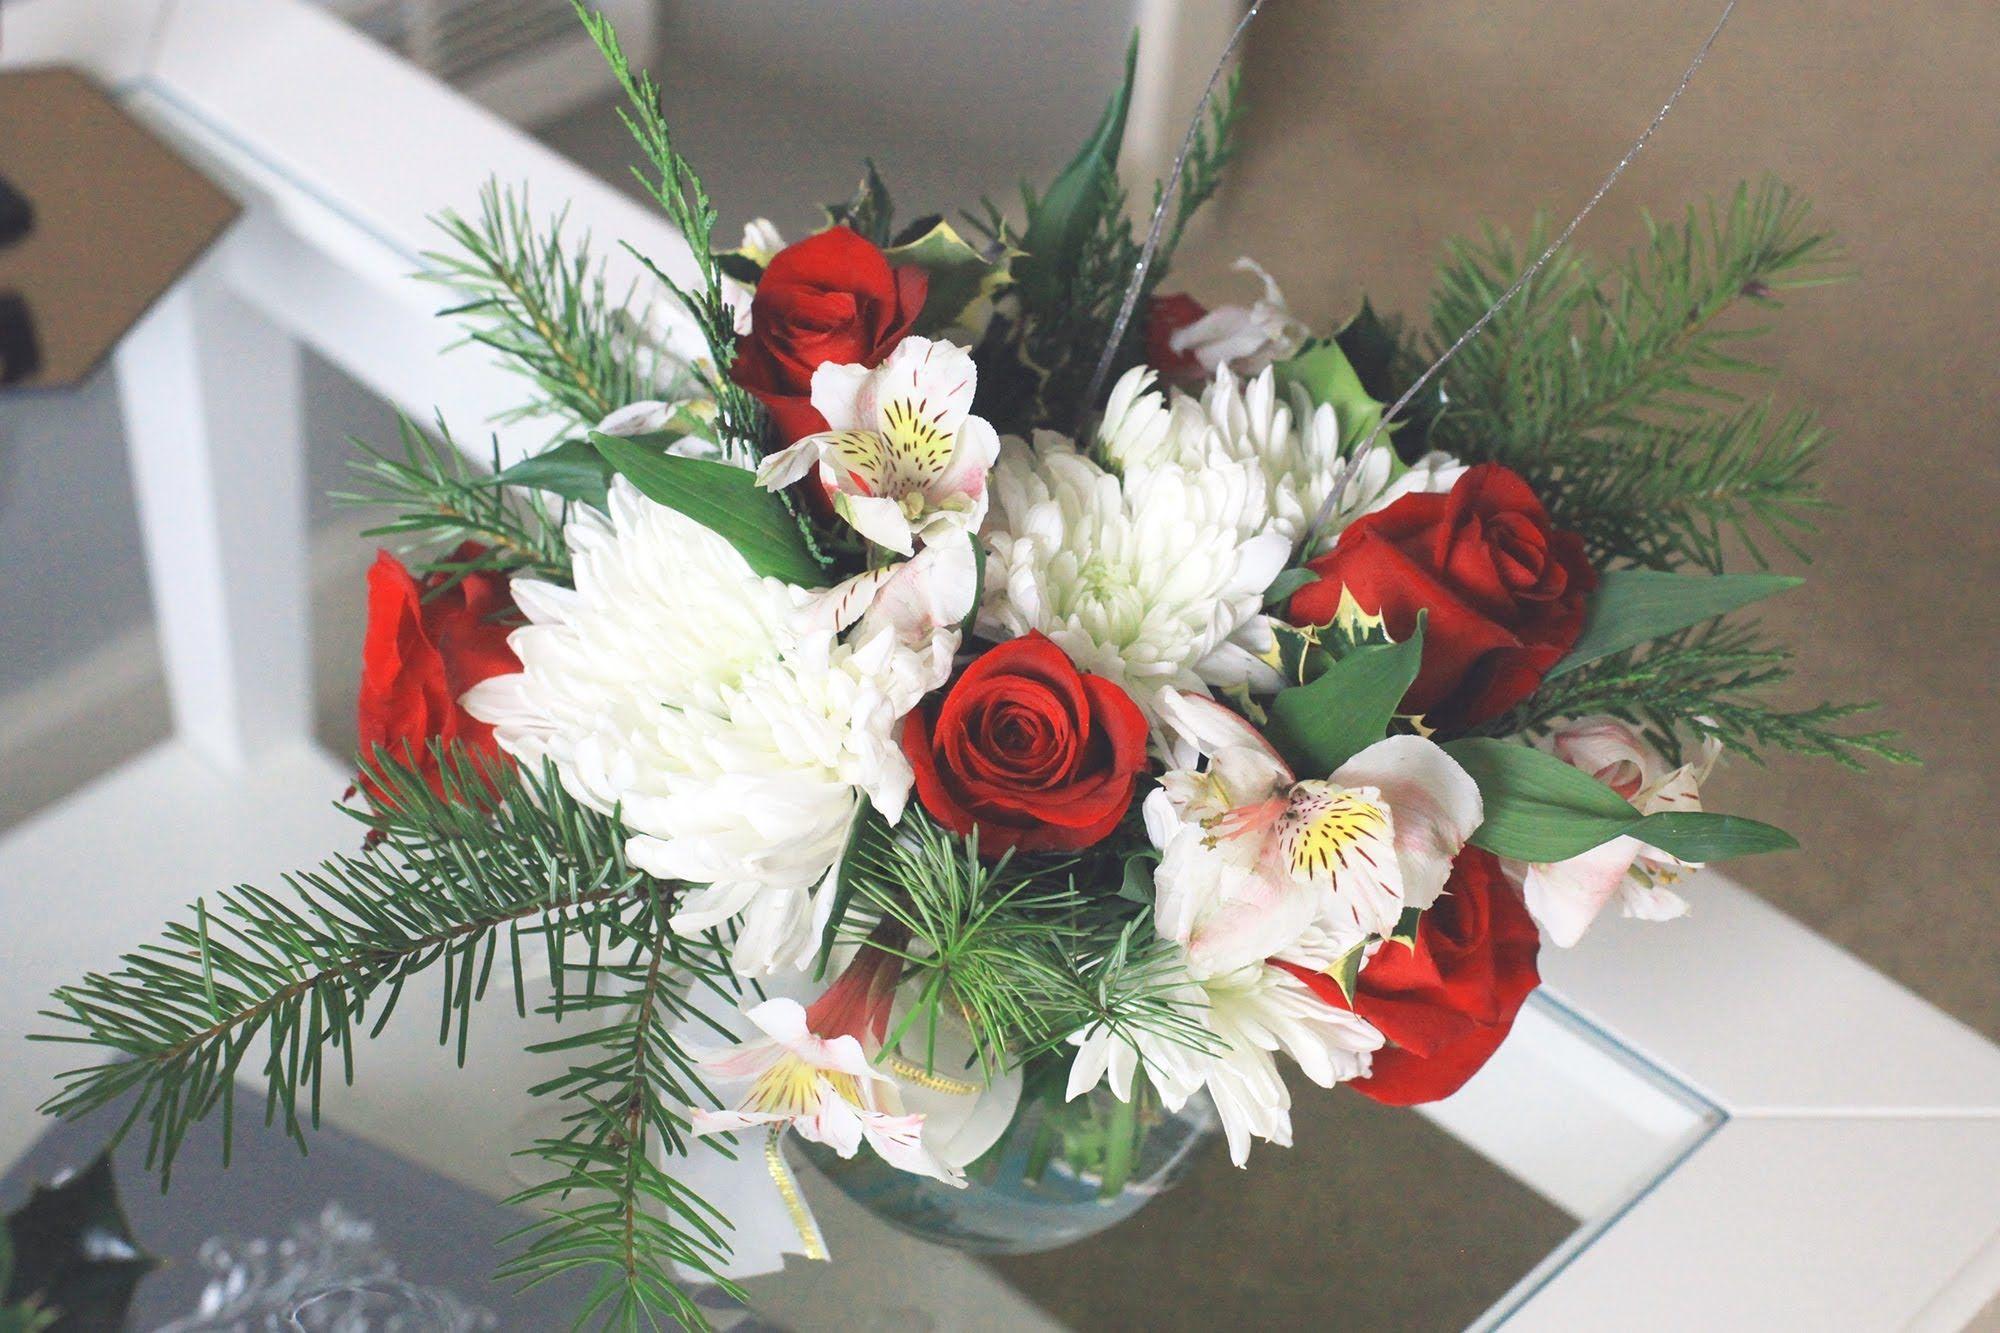 40 beautiful creative diy flower arrangement ideas diy flower 40 beautiful creative diy flower arrangement ideas izmirmasajfo Images